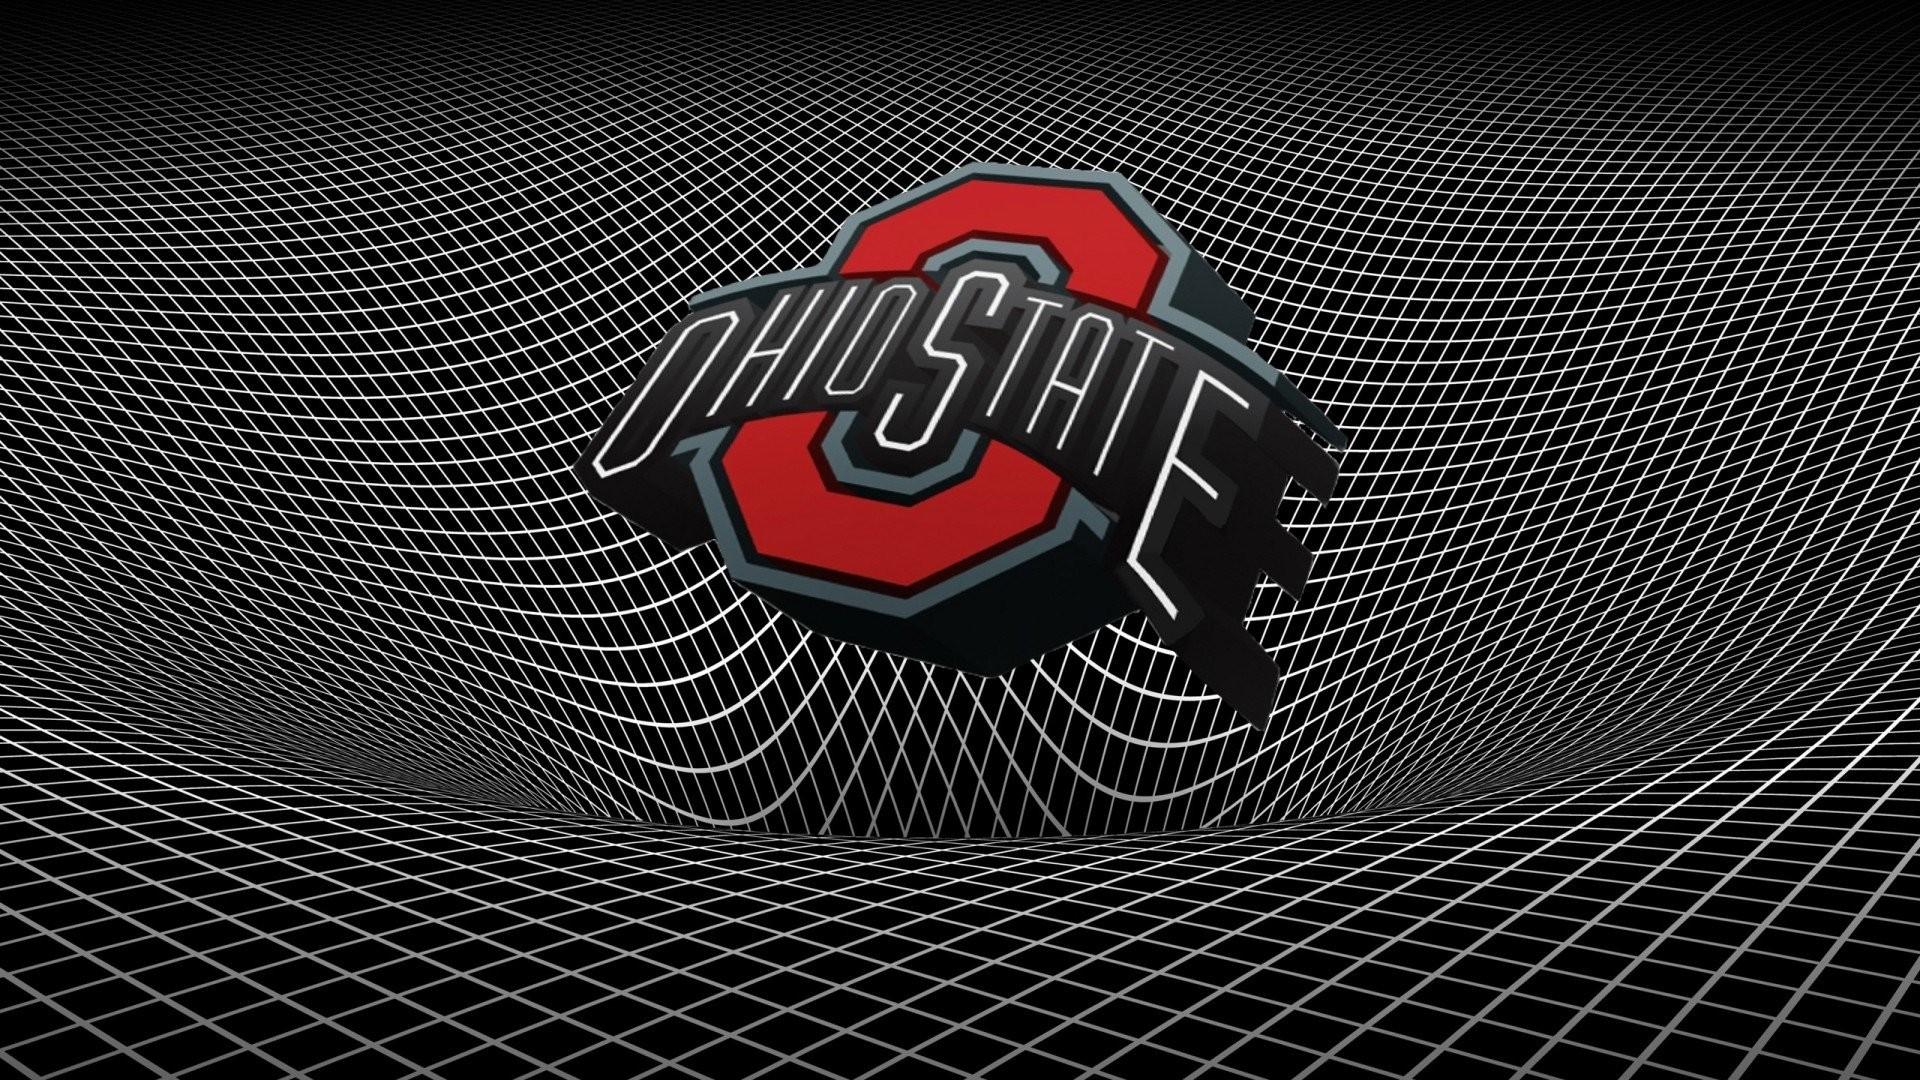 Res: 1920x1080, Sports American Football NFL logos Ohio State football teams Football Logos  wallpaper |  | 235917 | WallpaperUP